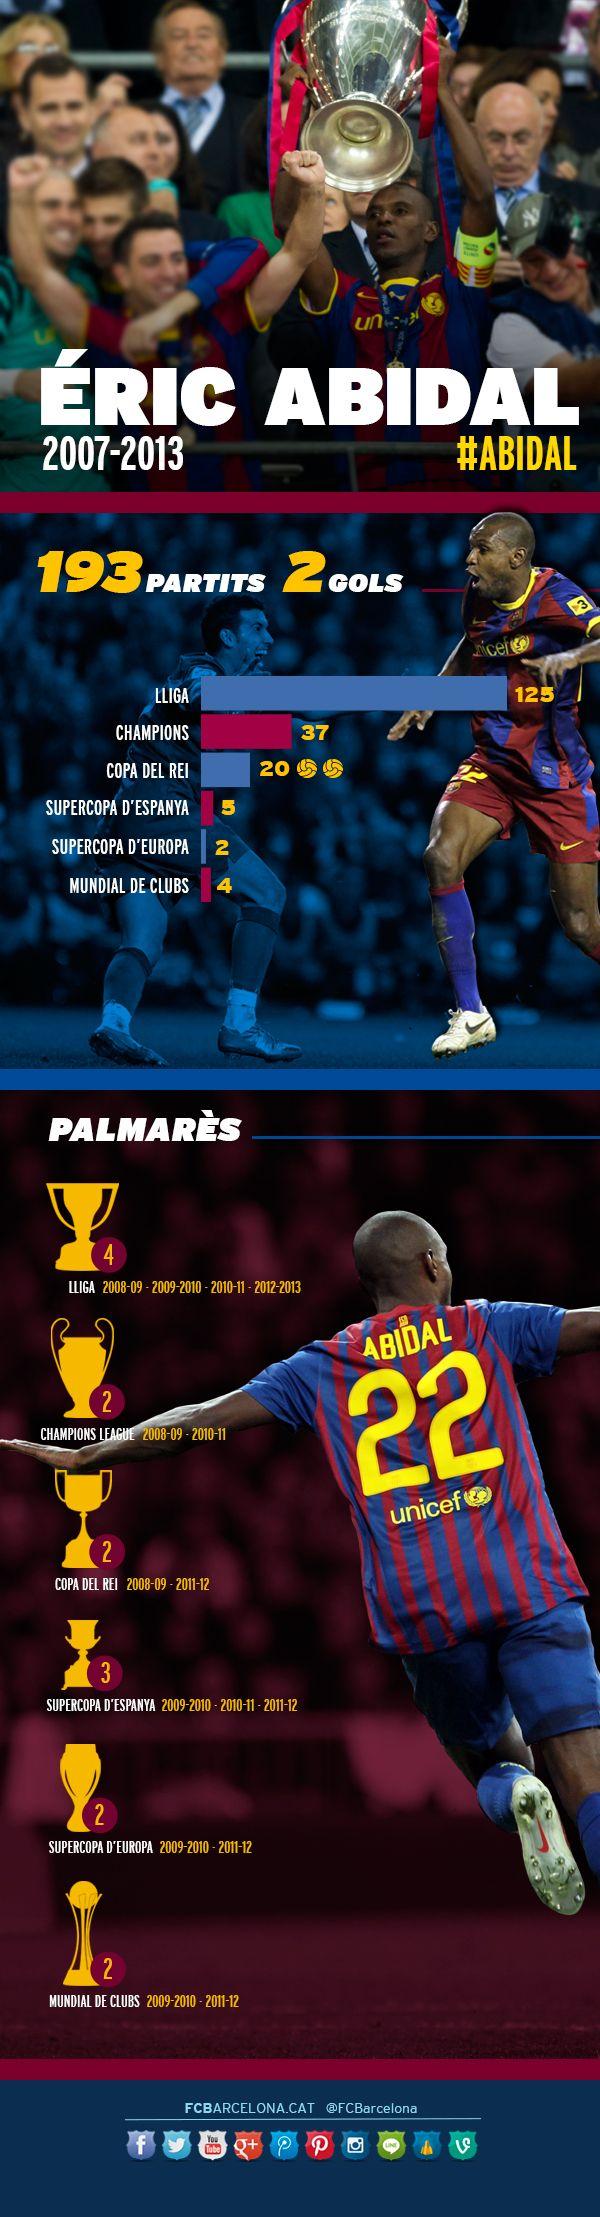 Eric Abidal's numbers while with FC Barcelona #FCBarcelona #FansFCB #Football #Abidal